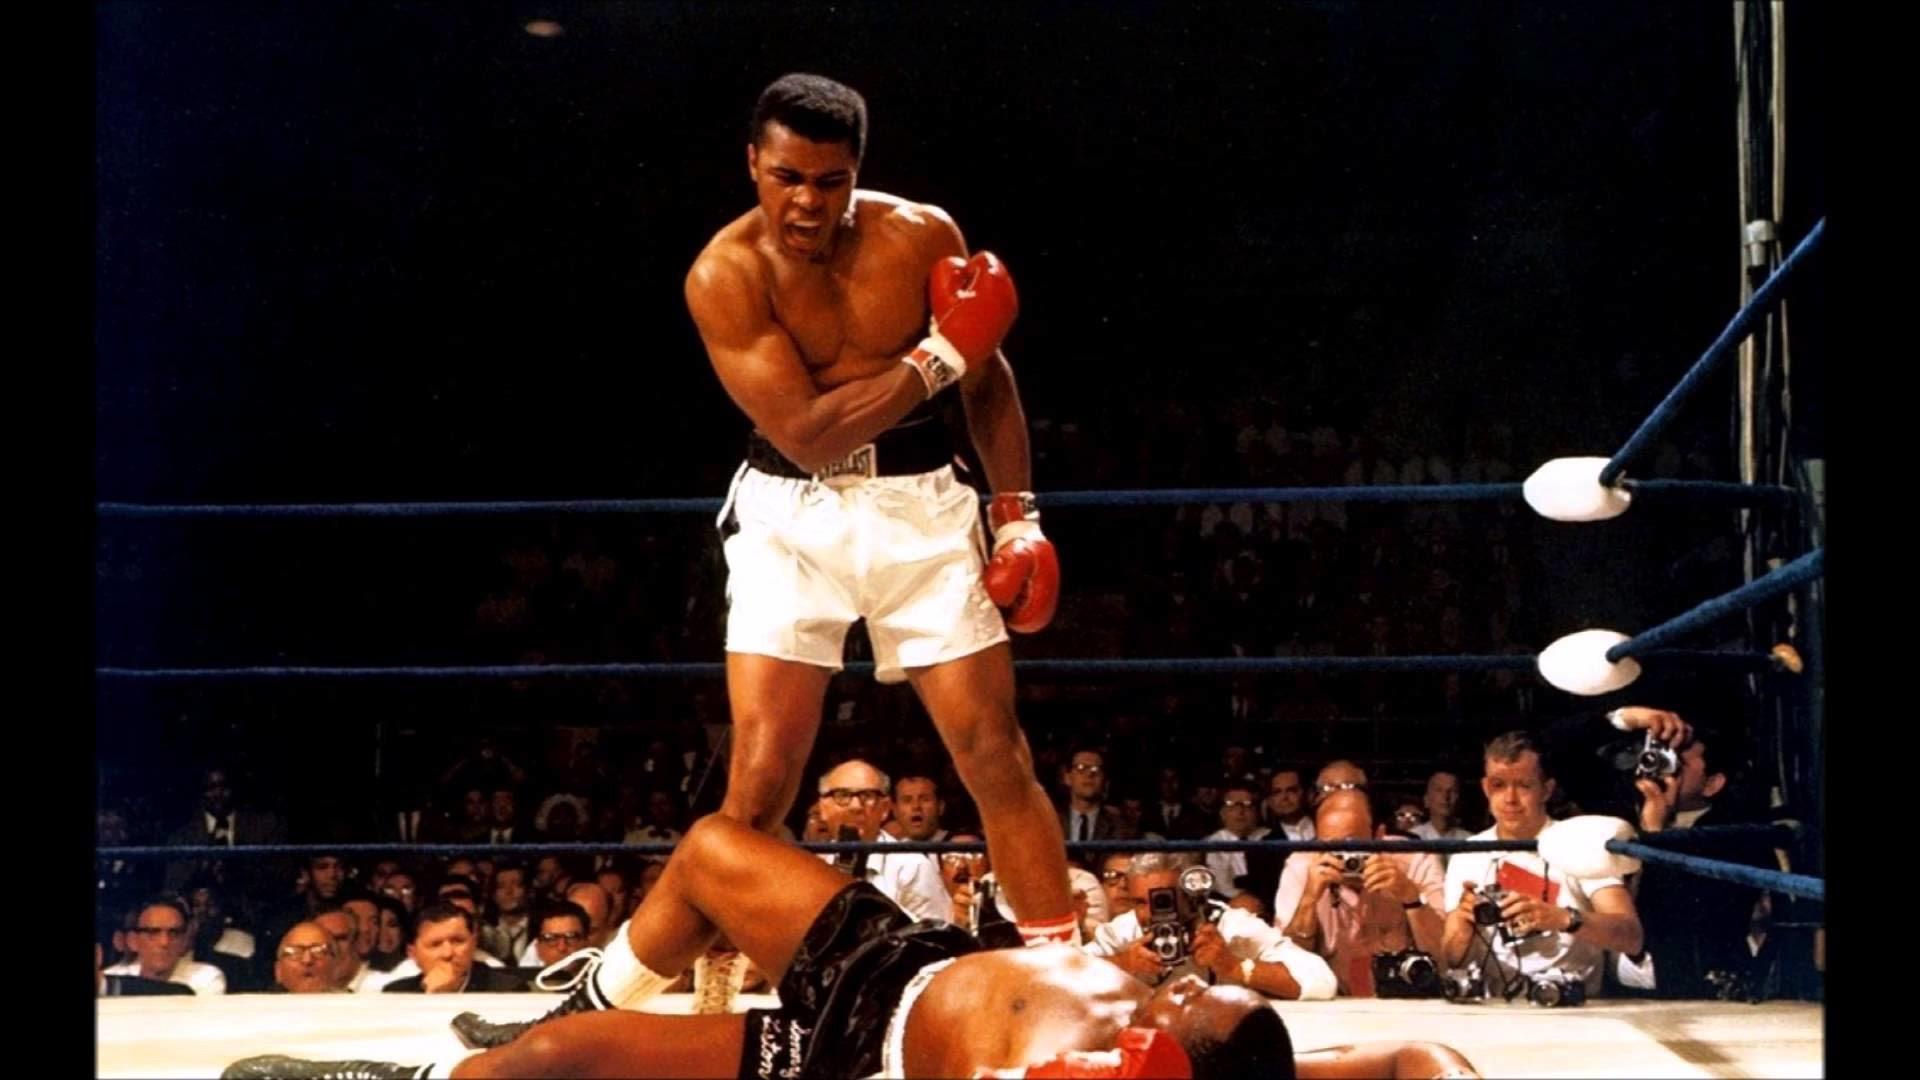 Muhammad Ali Wallpaper 1920x1080 78 Images